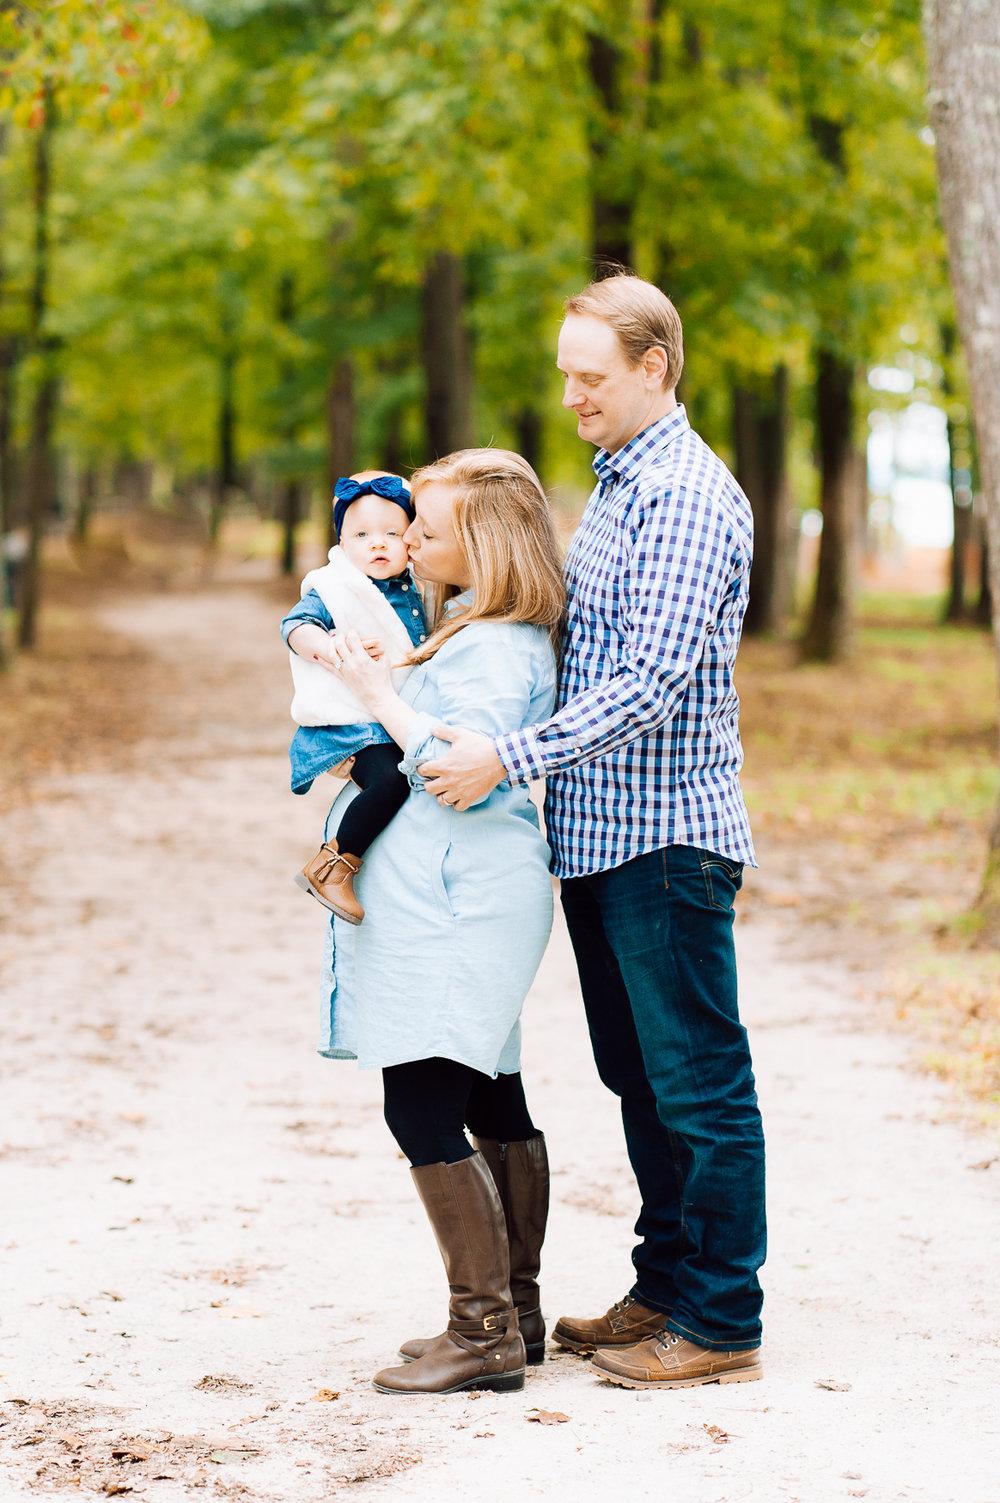 maternity_fallphotos_fredericksburgphotographer_leesylvania_youseephotography_Heather (7).jpg